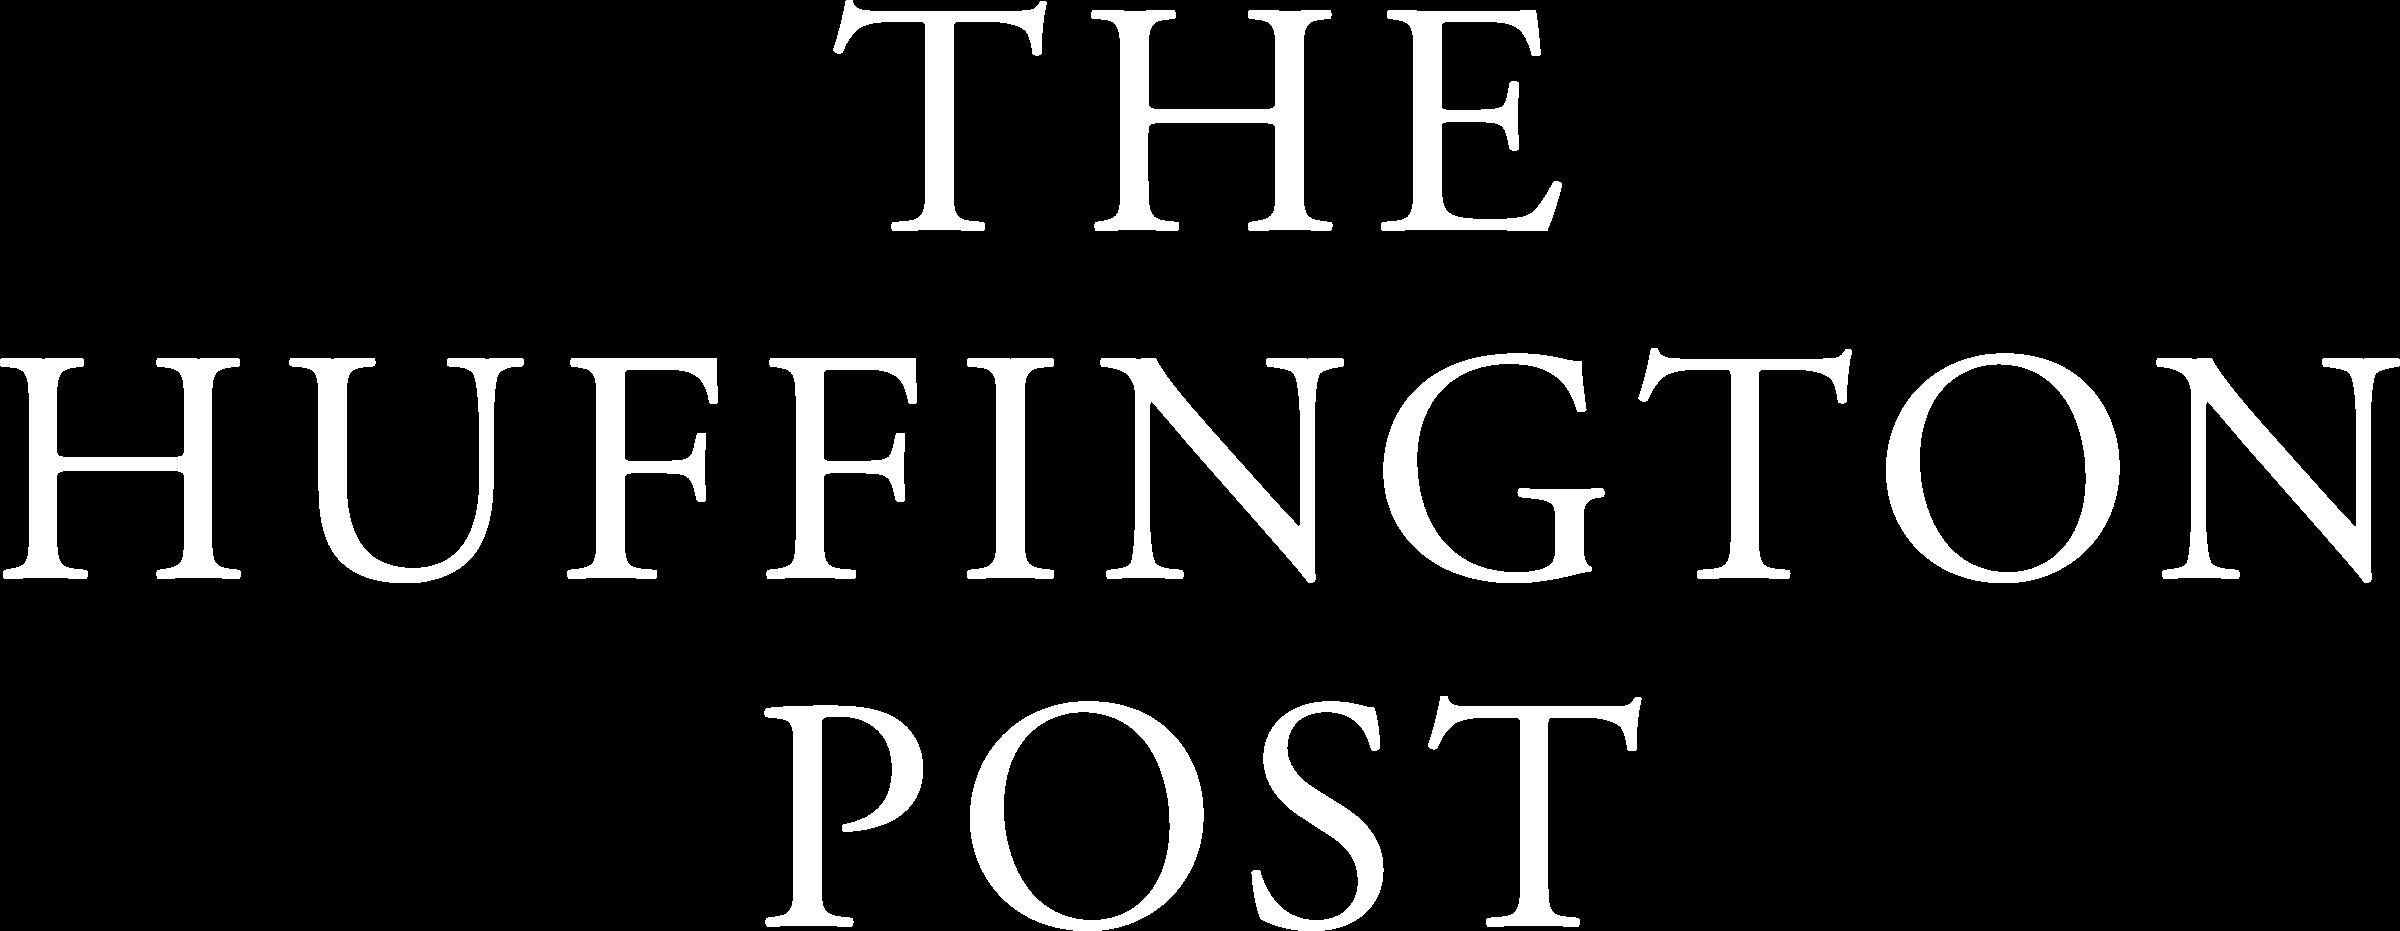 The Huffington Post Logo PNG Transparent & SVG Vector.